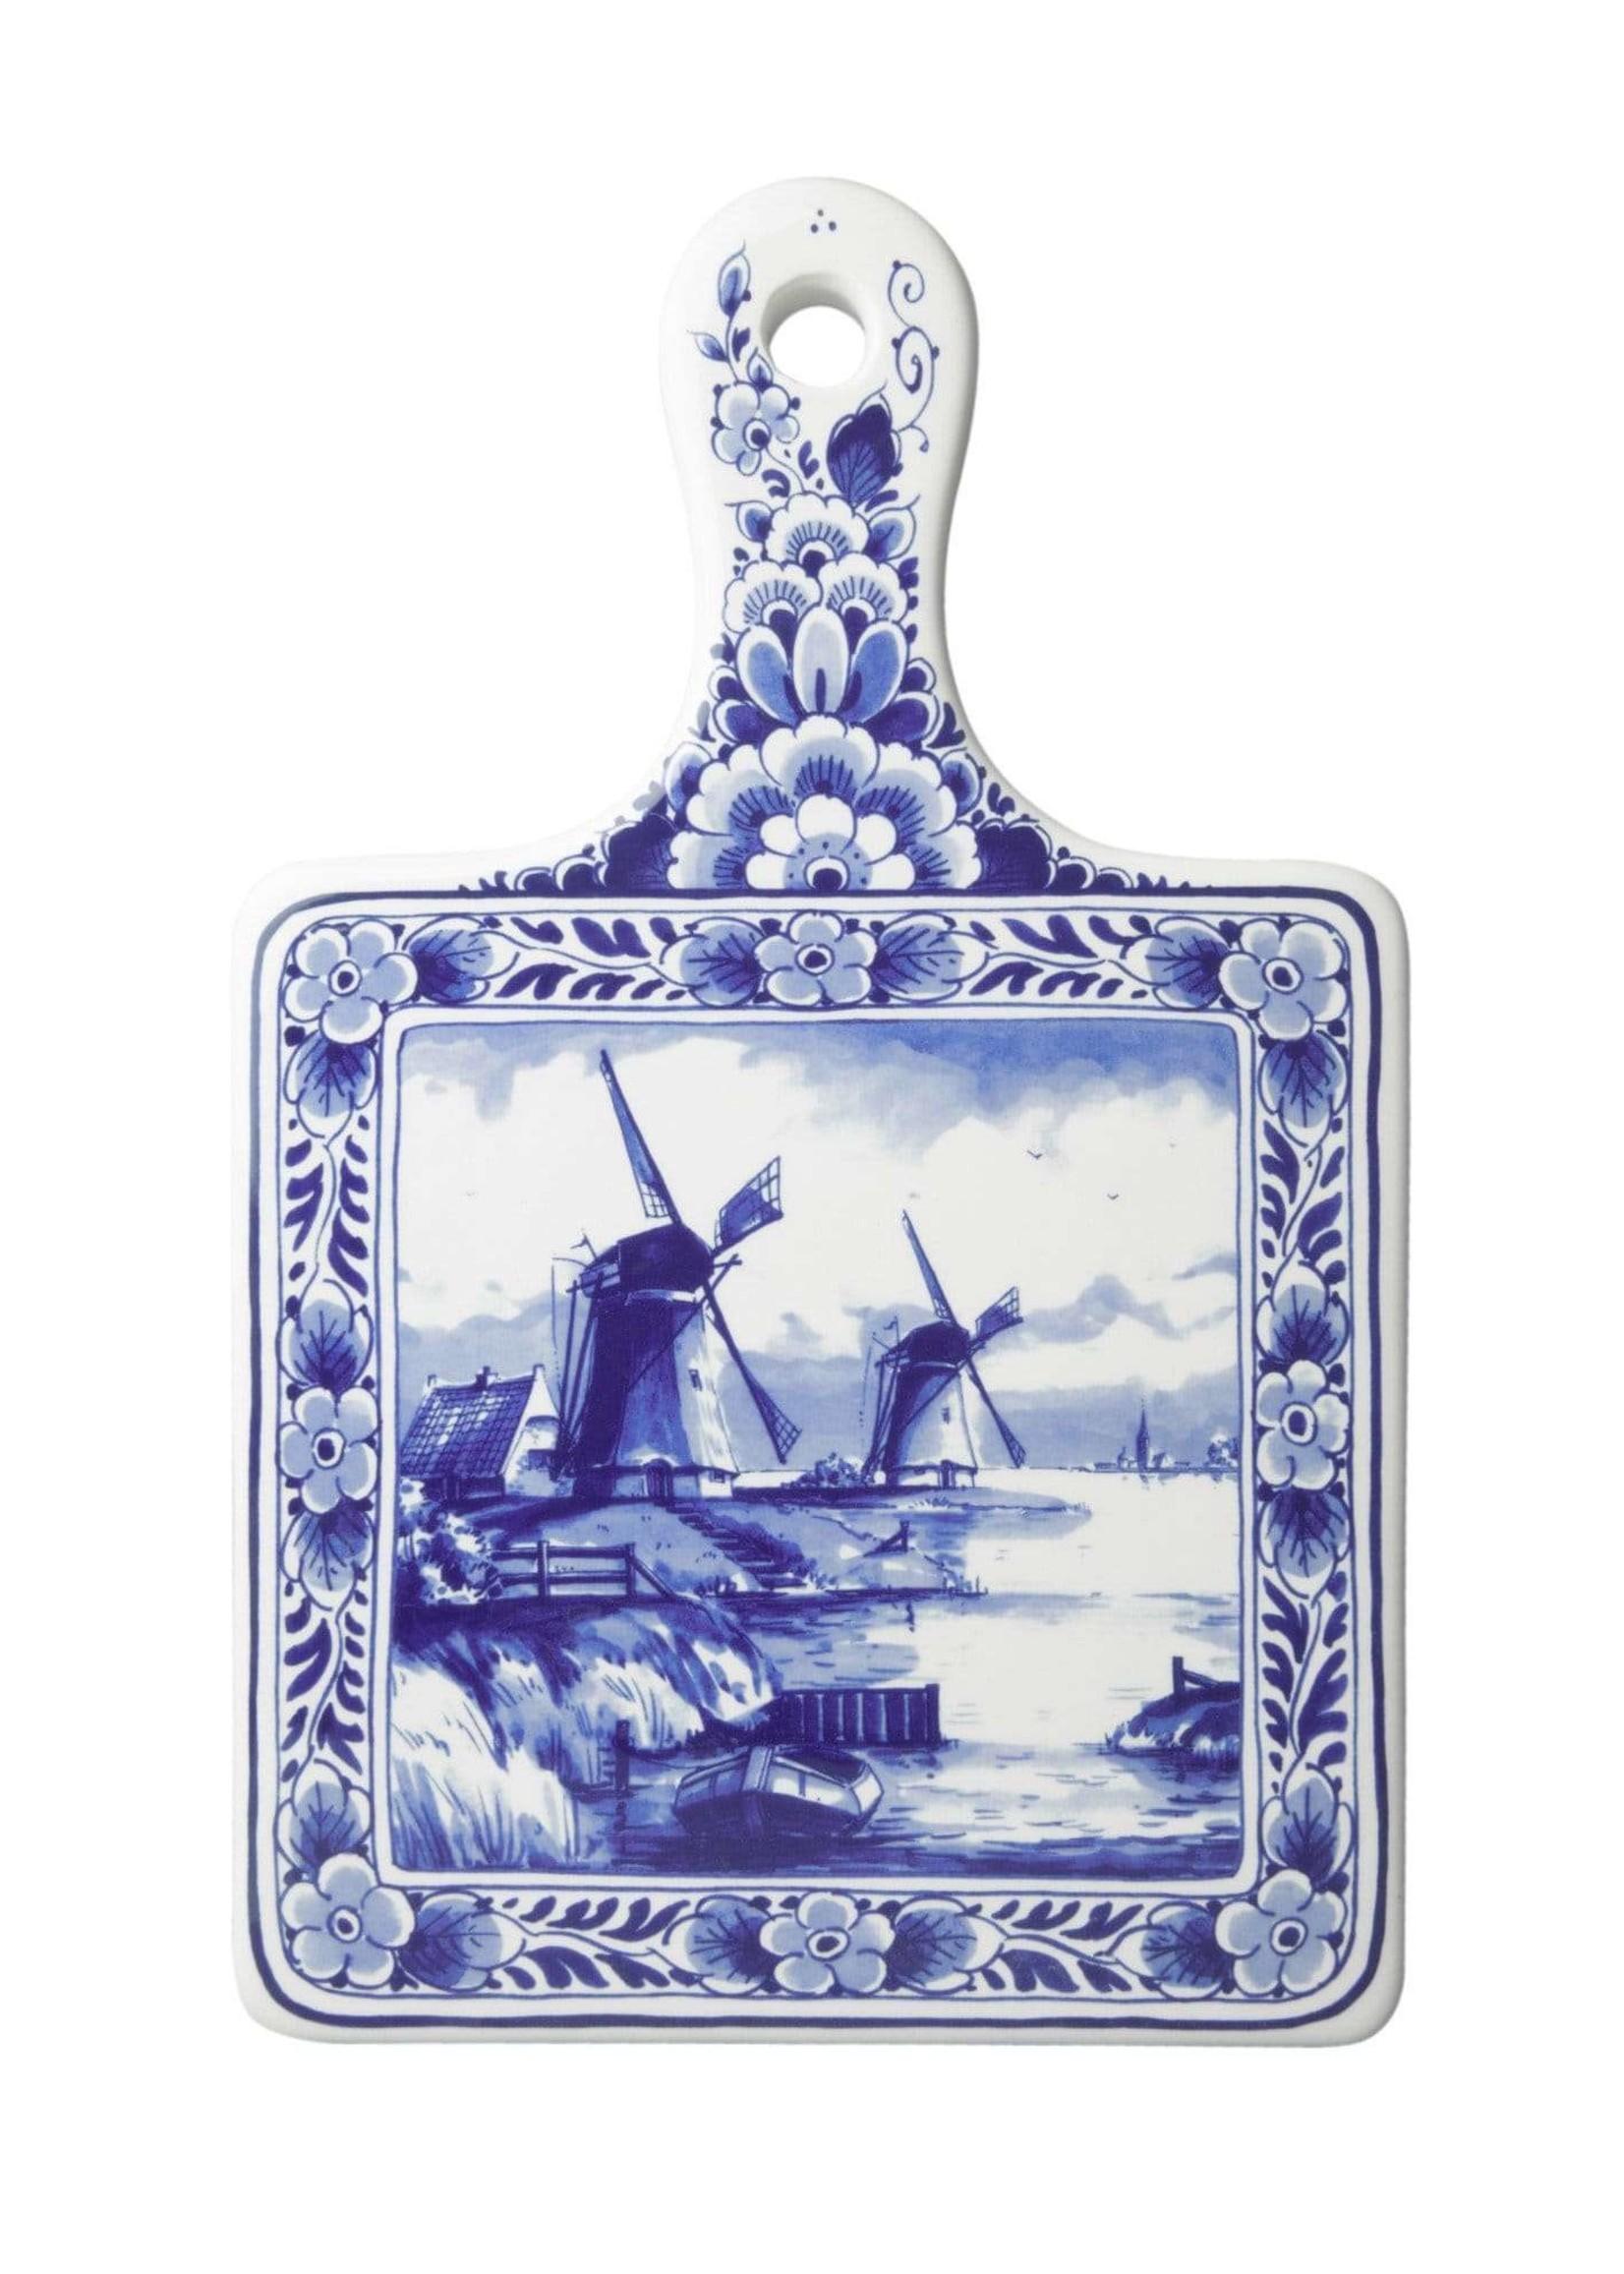 Delfts Blauwe Kaasplank met Windmolens, Groot